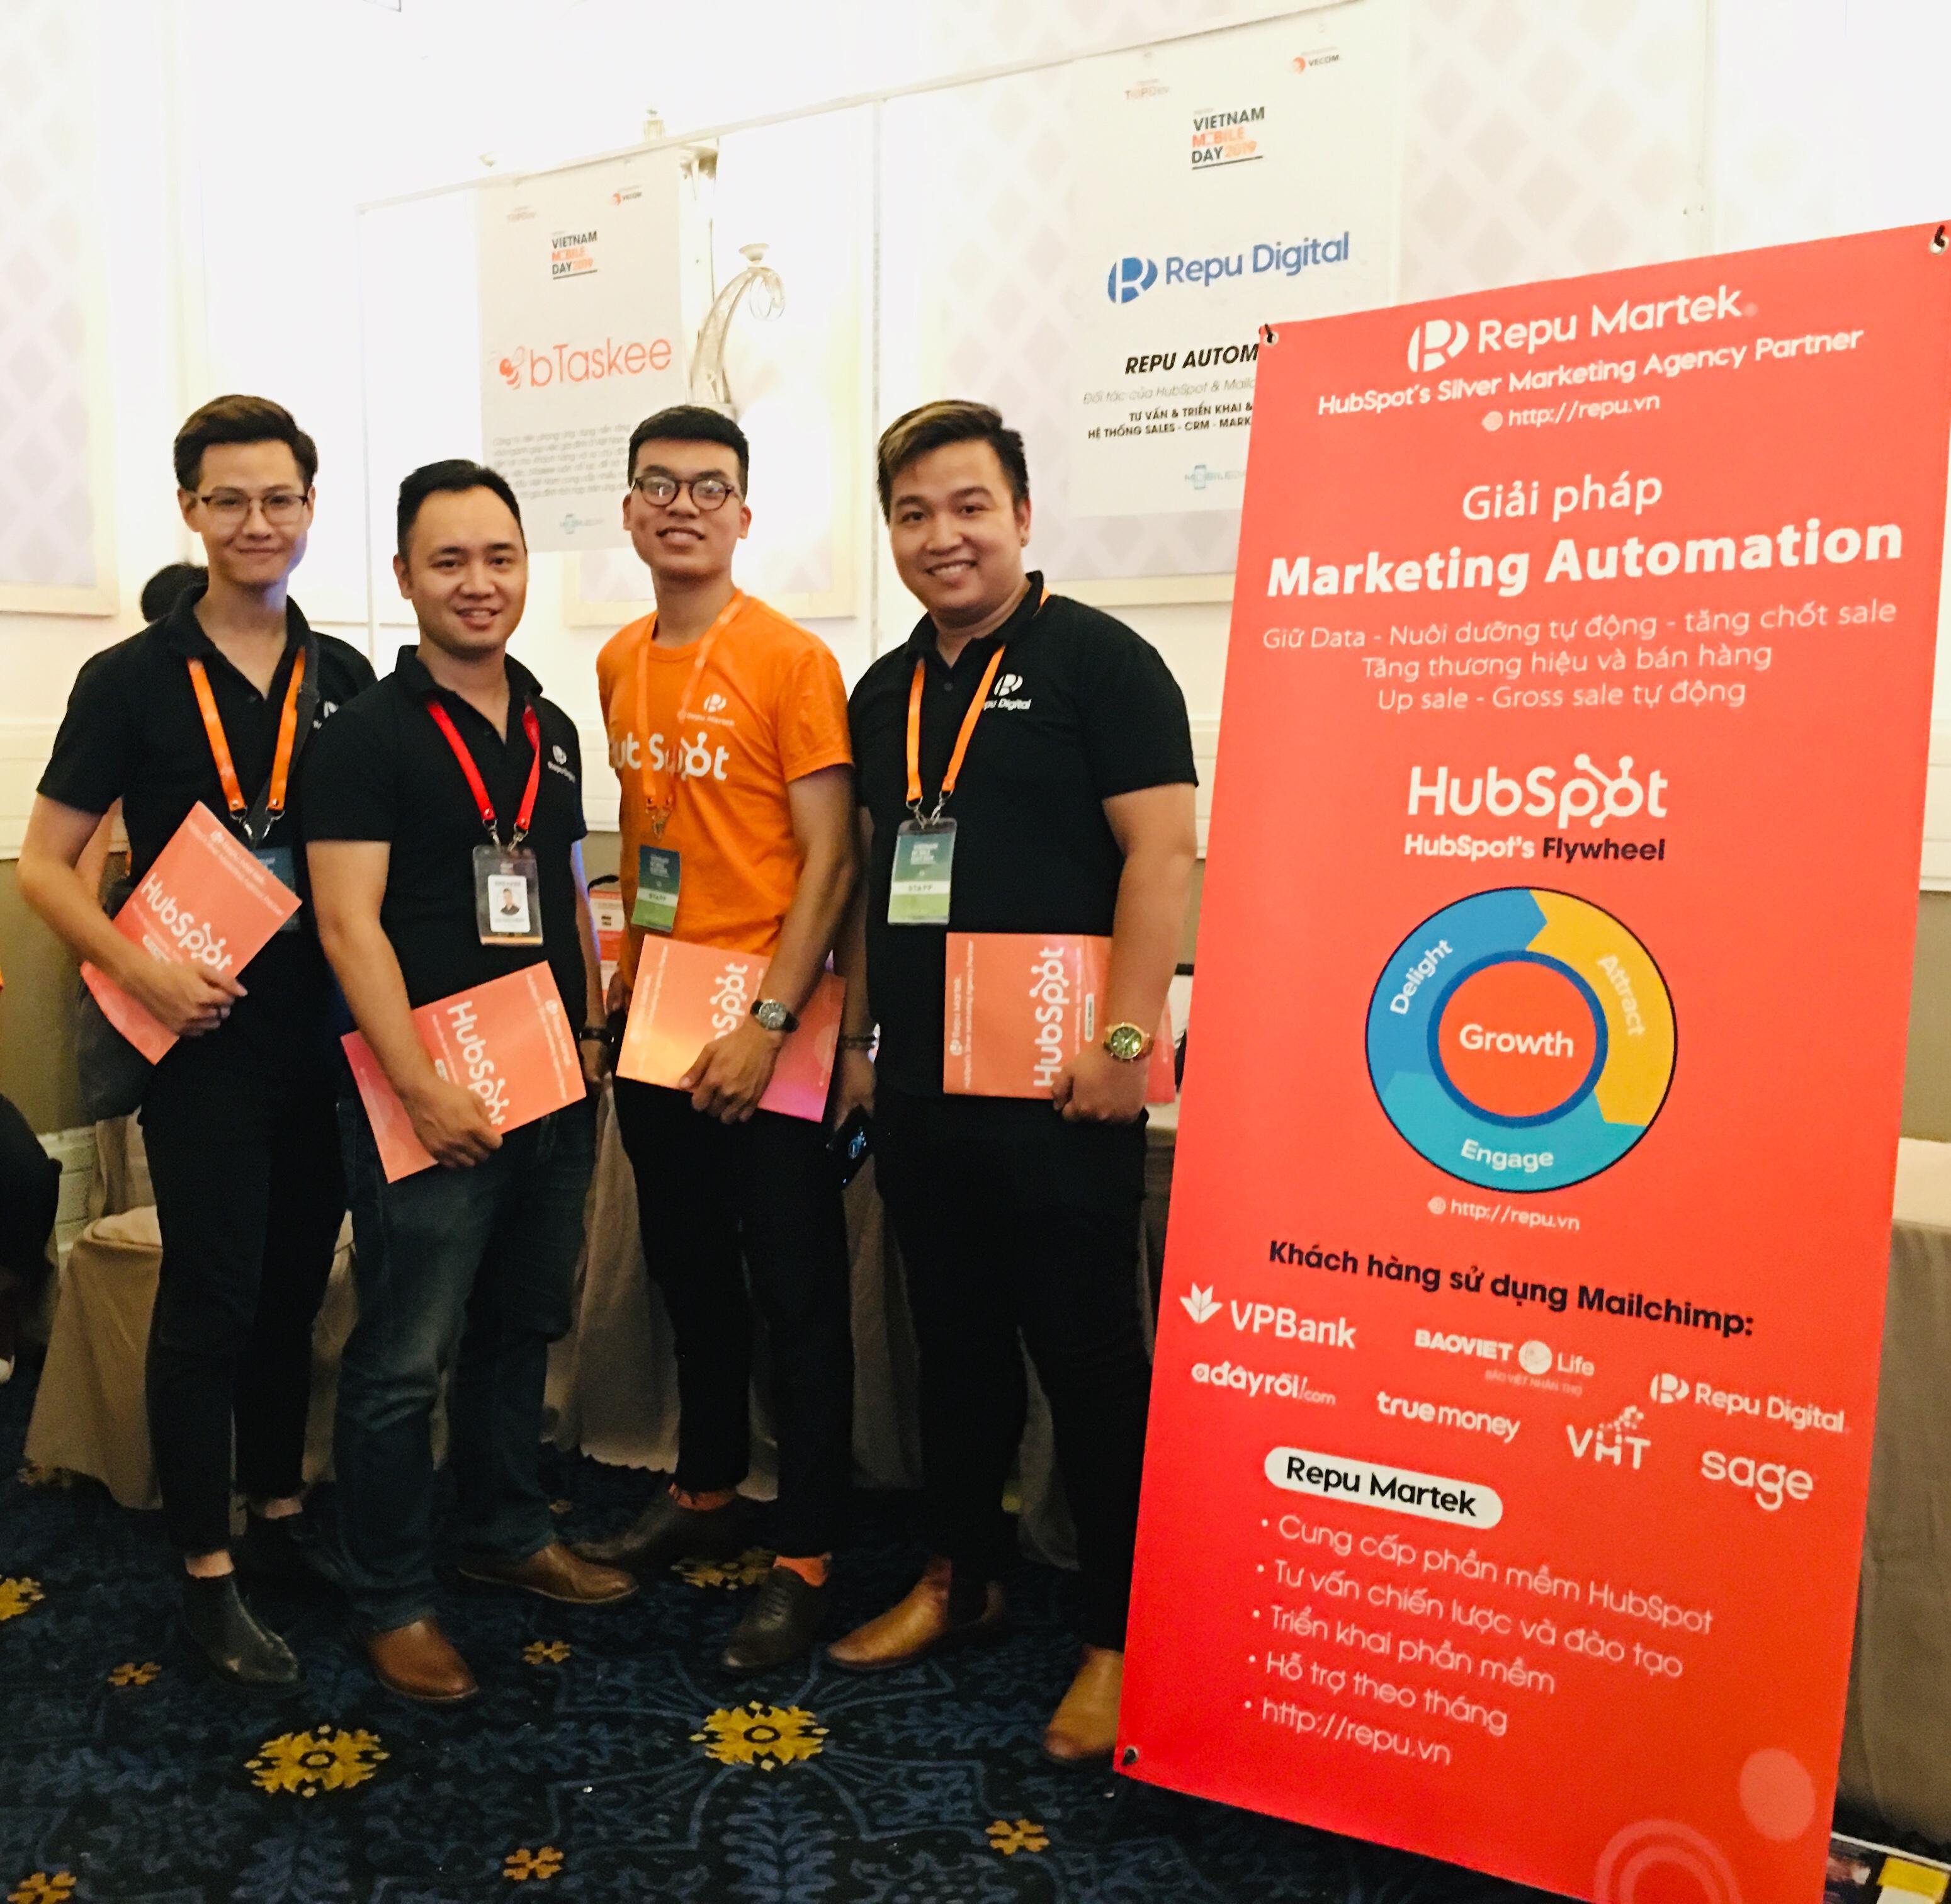 HubSpot và Repu Digital tại Vietnam Mobile Day 2019 - Ảnh 01